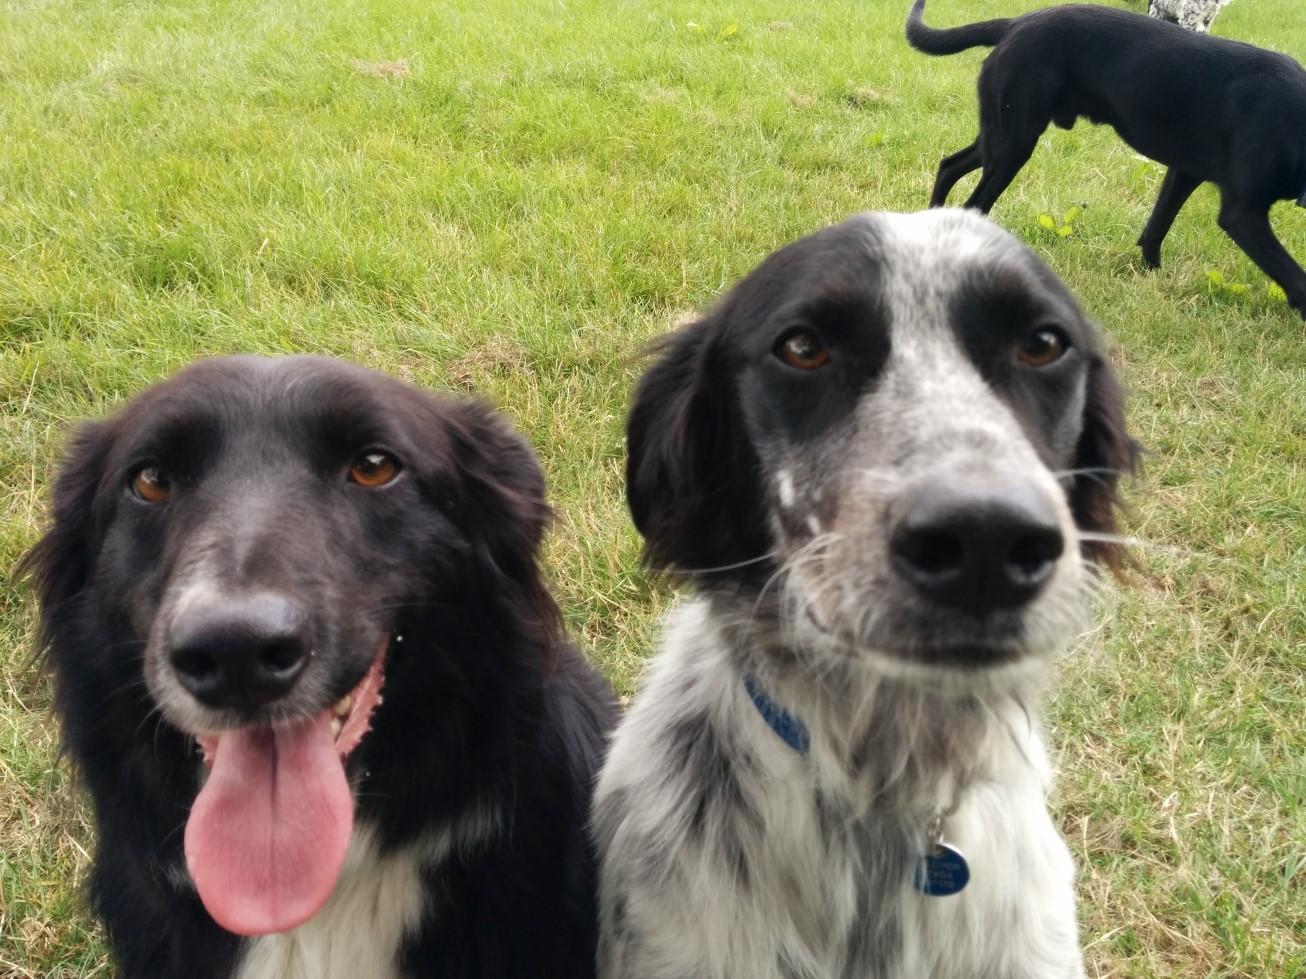 dog day care photos archives   zara s doggy day care